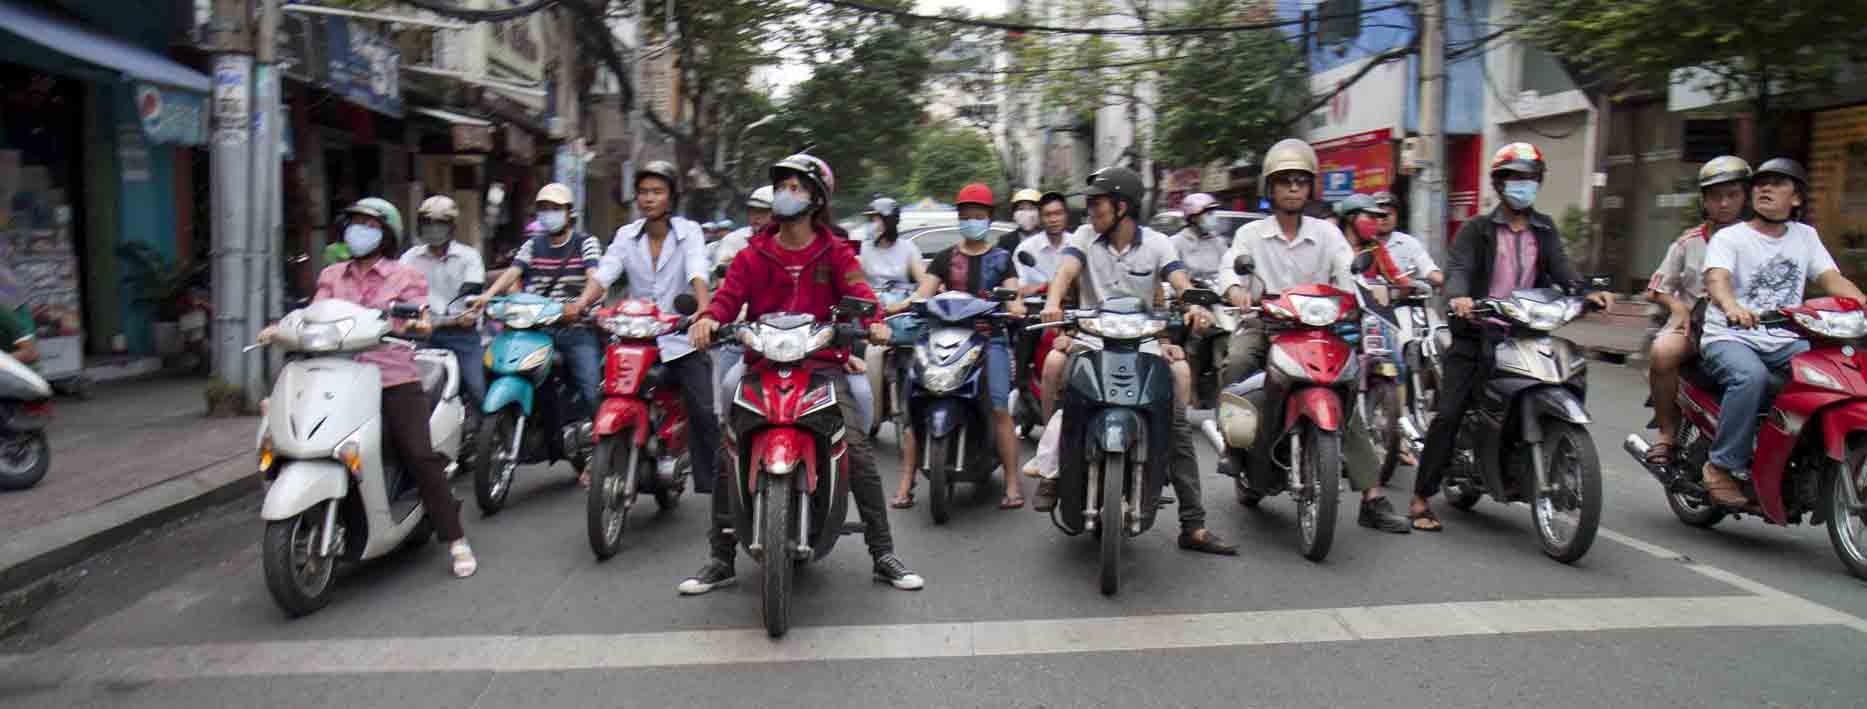 Saigon scooters